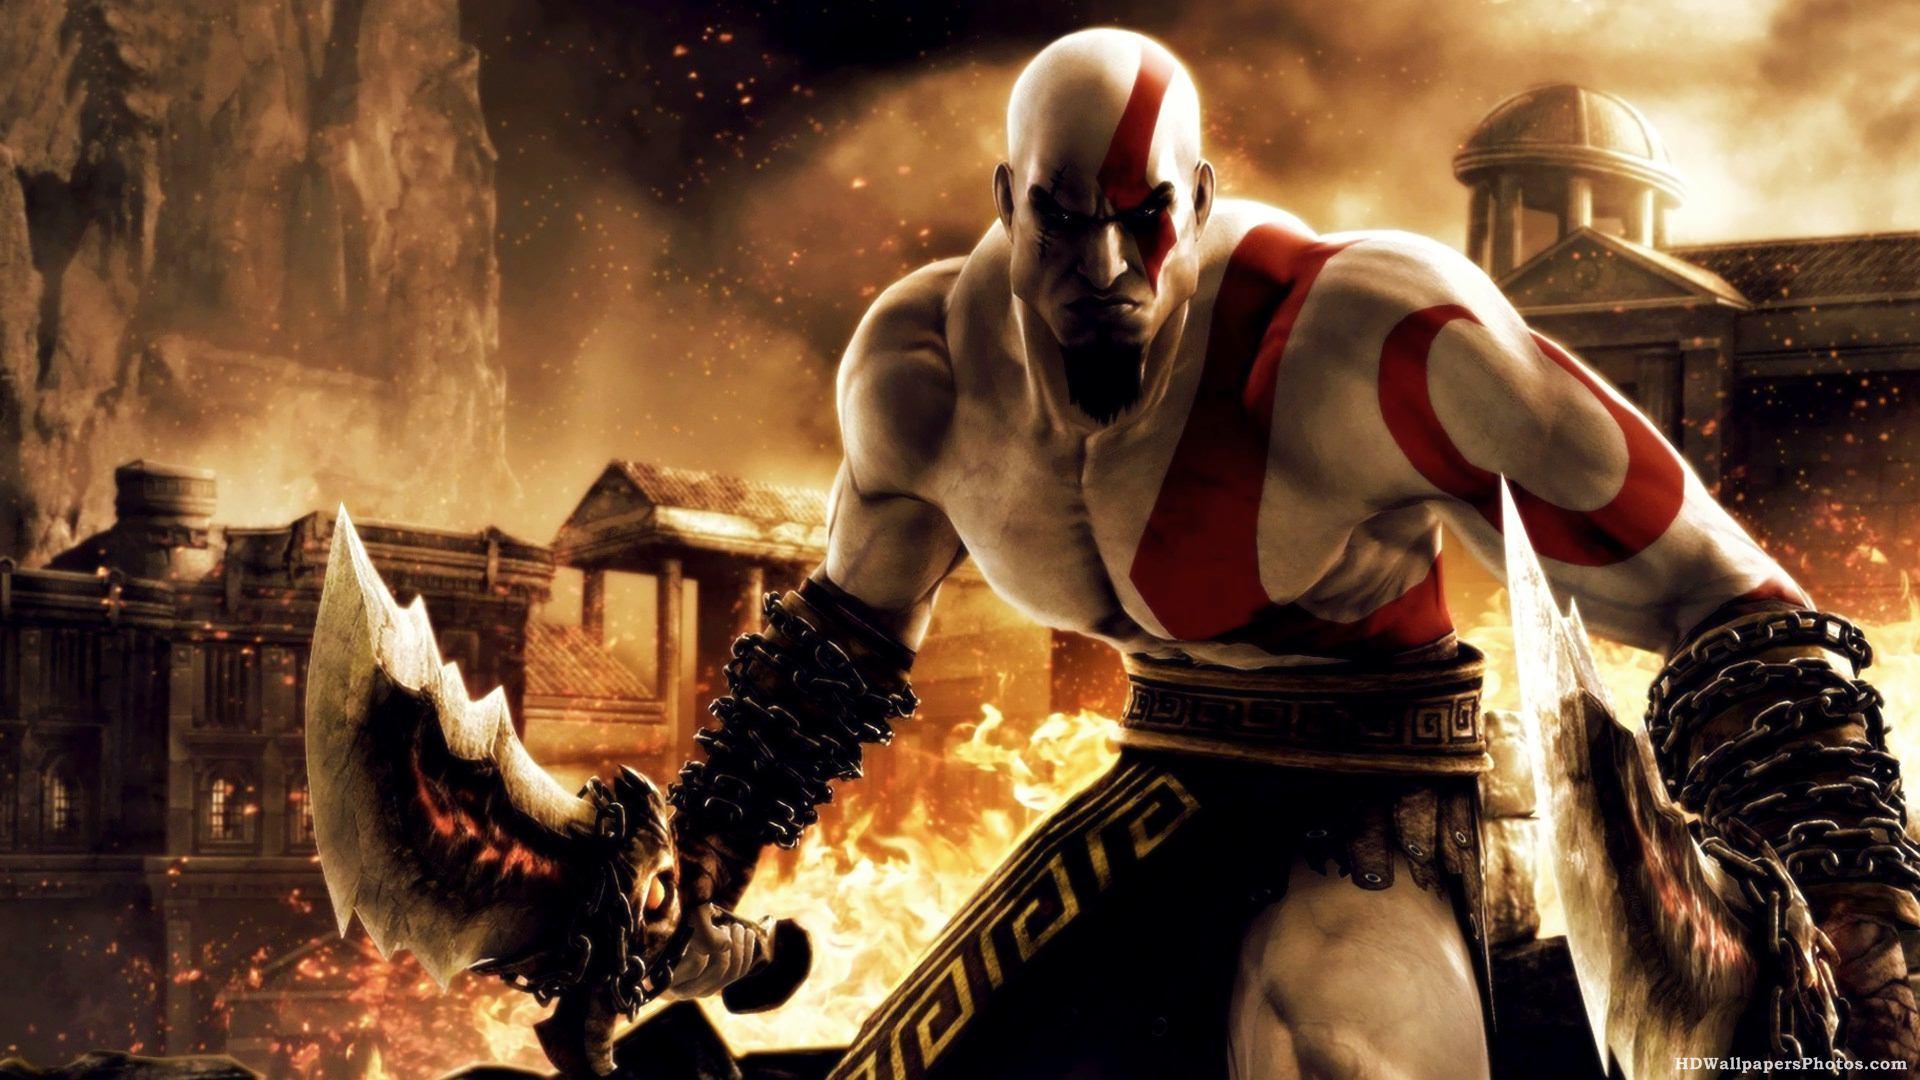 Kratos wallpaper hd wallpapersafari - God of war wallpaper hd 3d ...